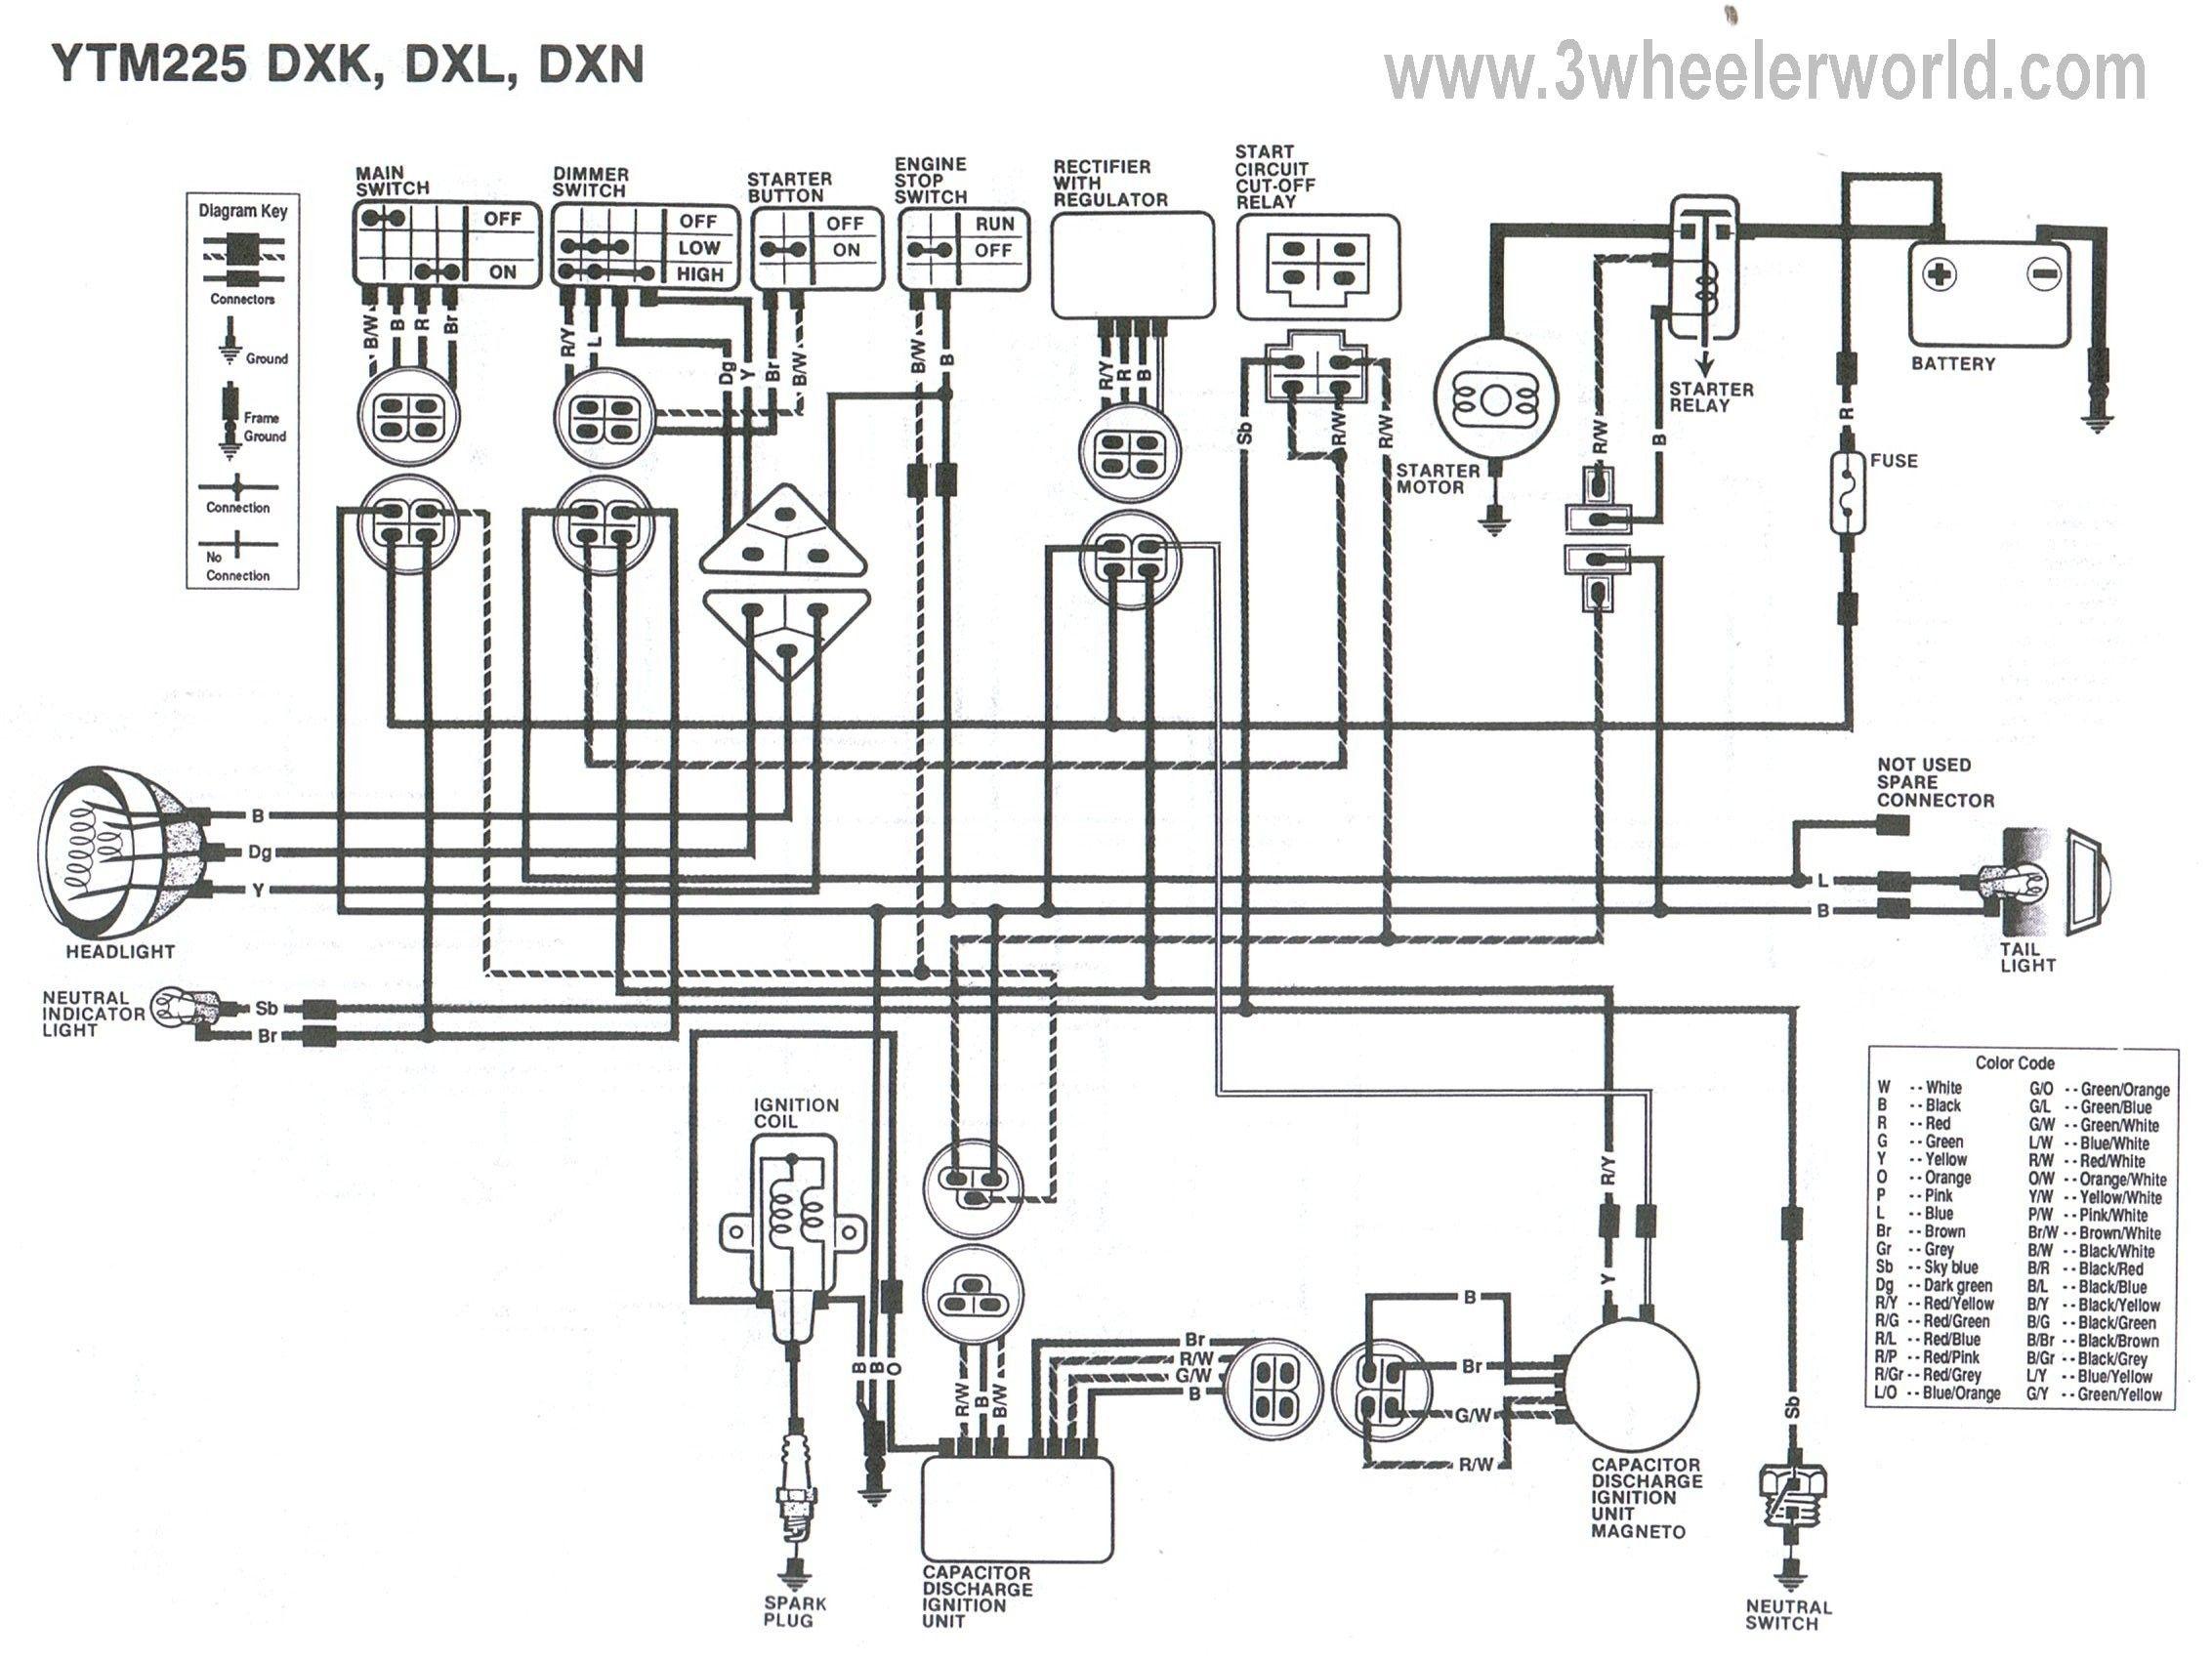 new yamaha wiring diagram symbols #diagrams #digramssample #diagramimages  #wiringdiagramsample #wiringdiagram chec…   big dog motorcycle, motorcycle  wiring, diagram  pinterest